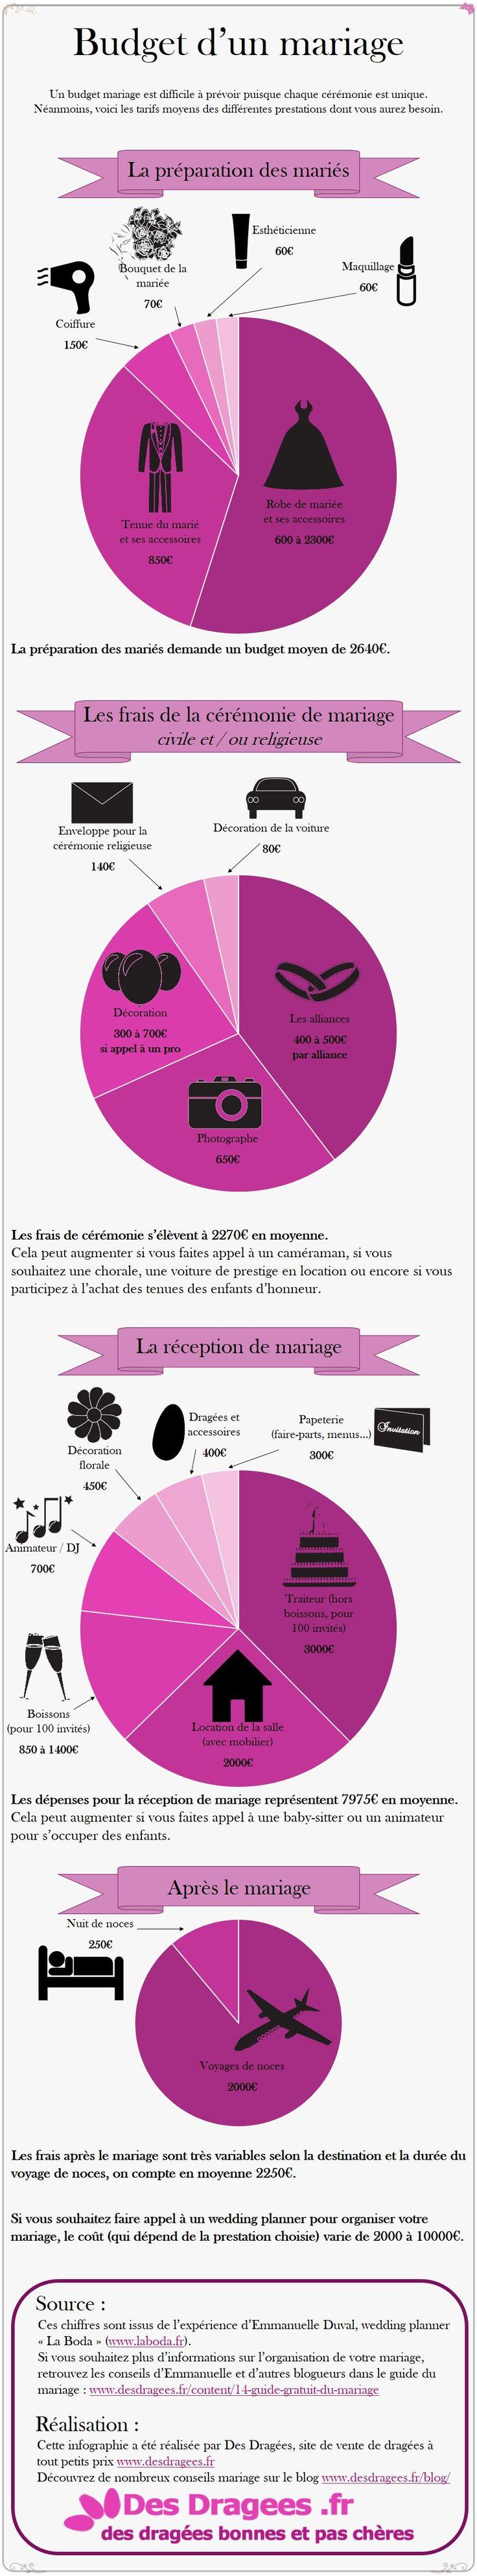 Idée de budget d'un mariage